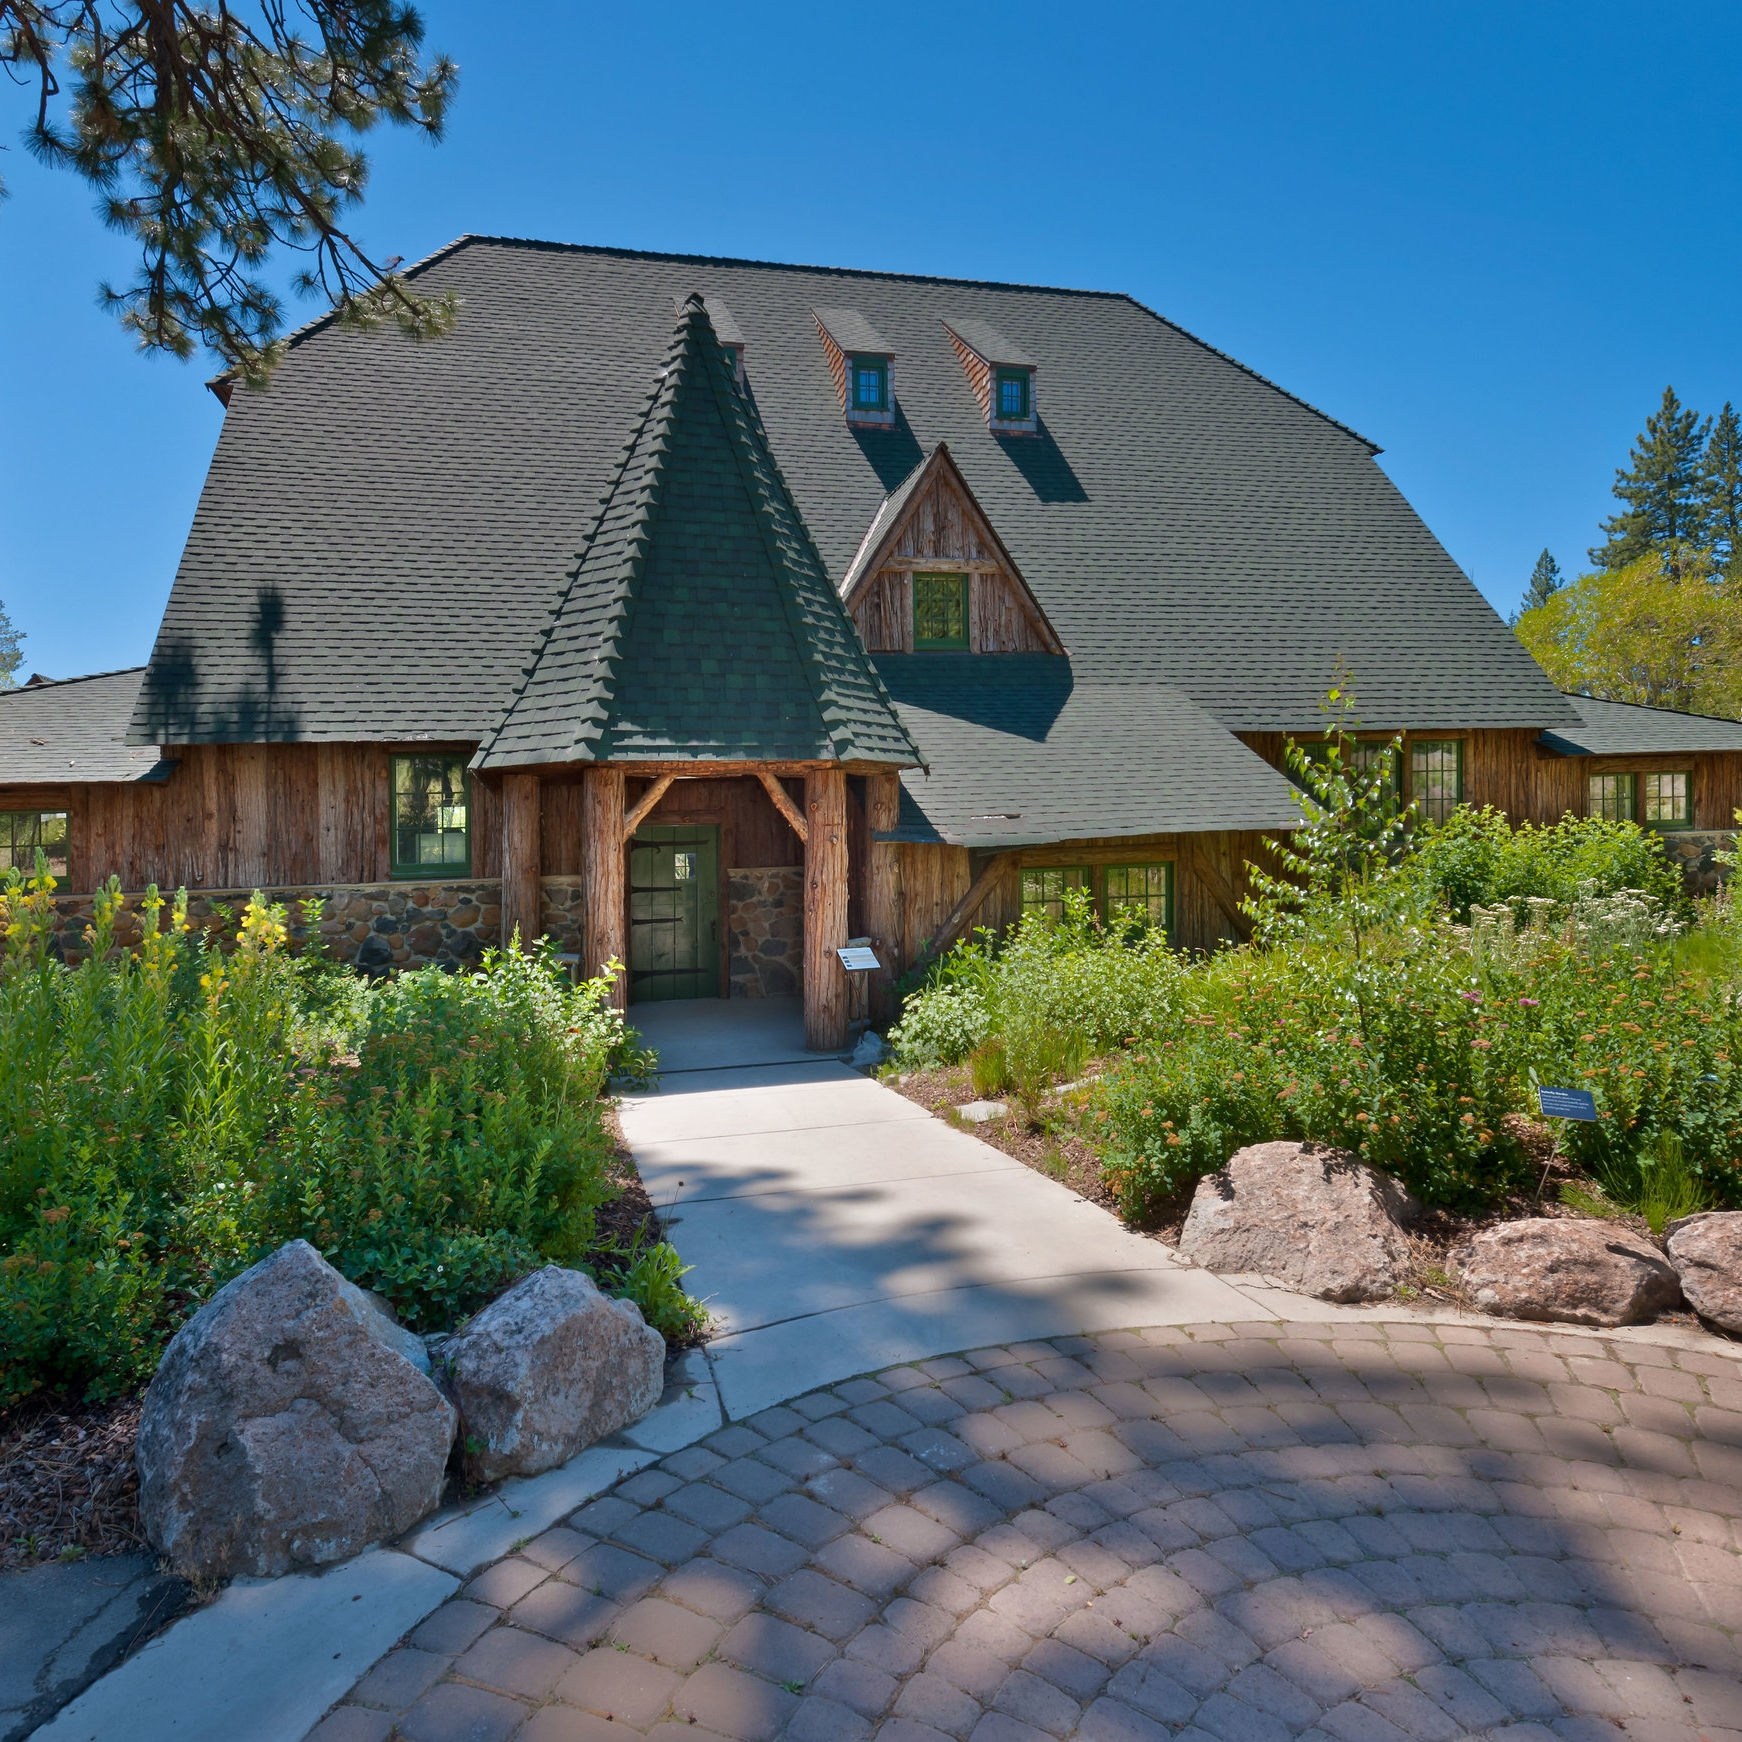 uC davis tahoe environmental research center (tahoe fish hatchery historic restoration) -